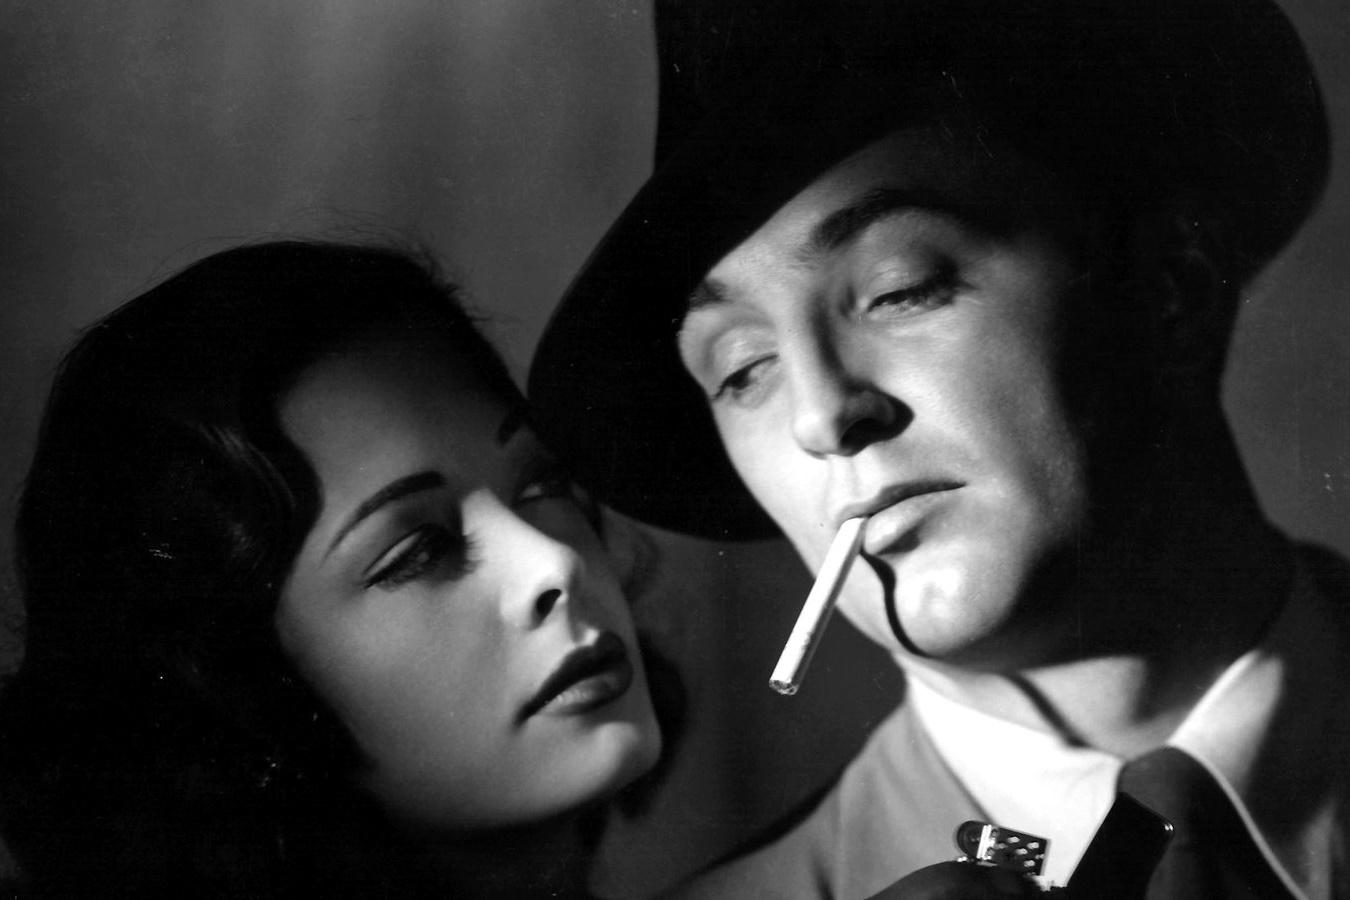 Out of the Past (1947): Karanlık Geçmişe Doğru Sürüklenme Formülleri